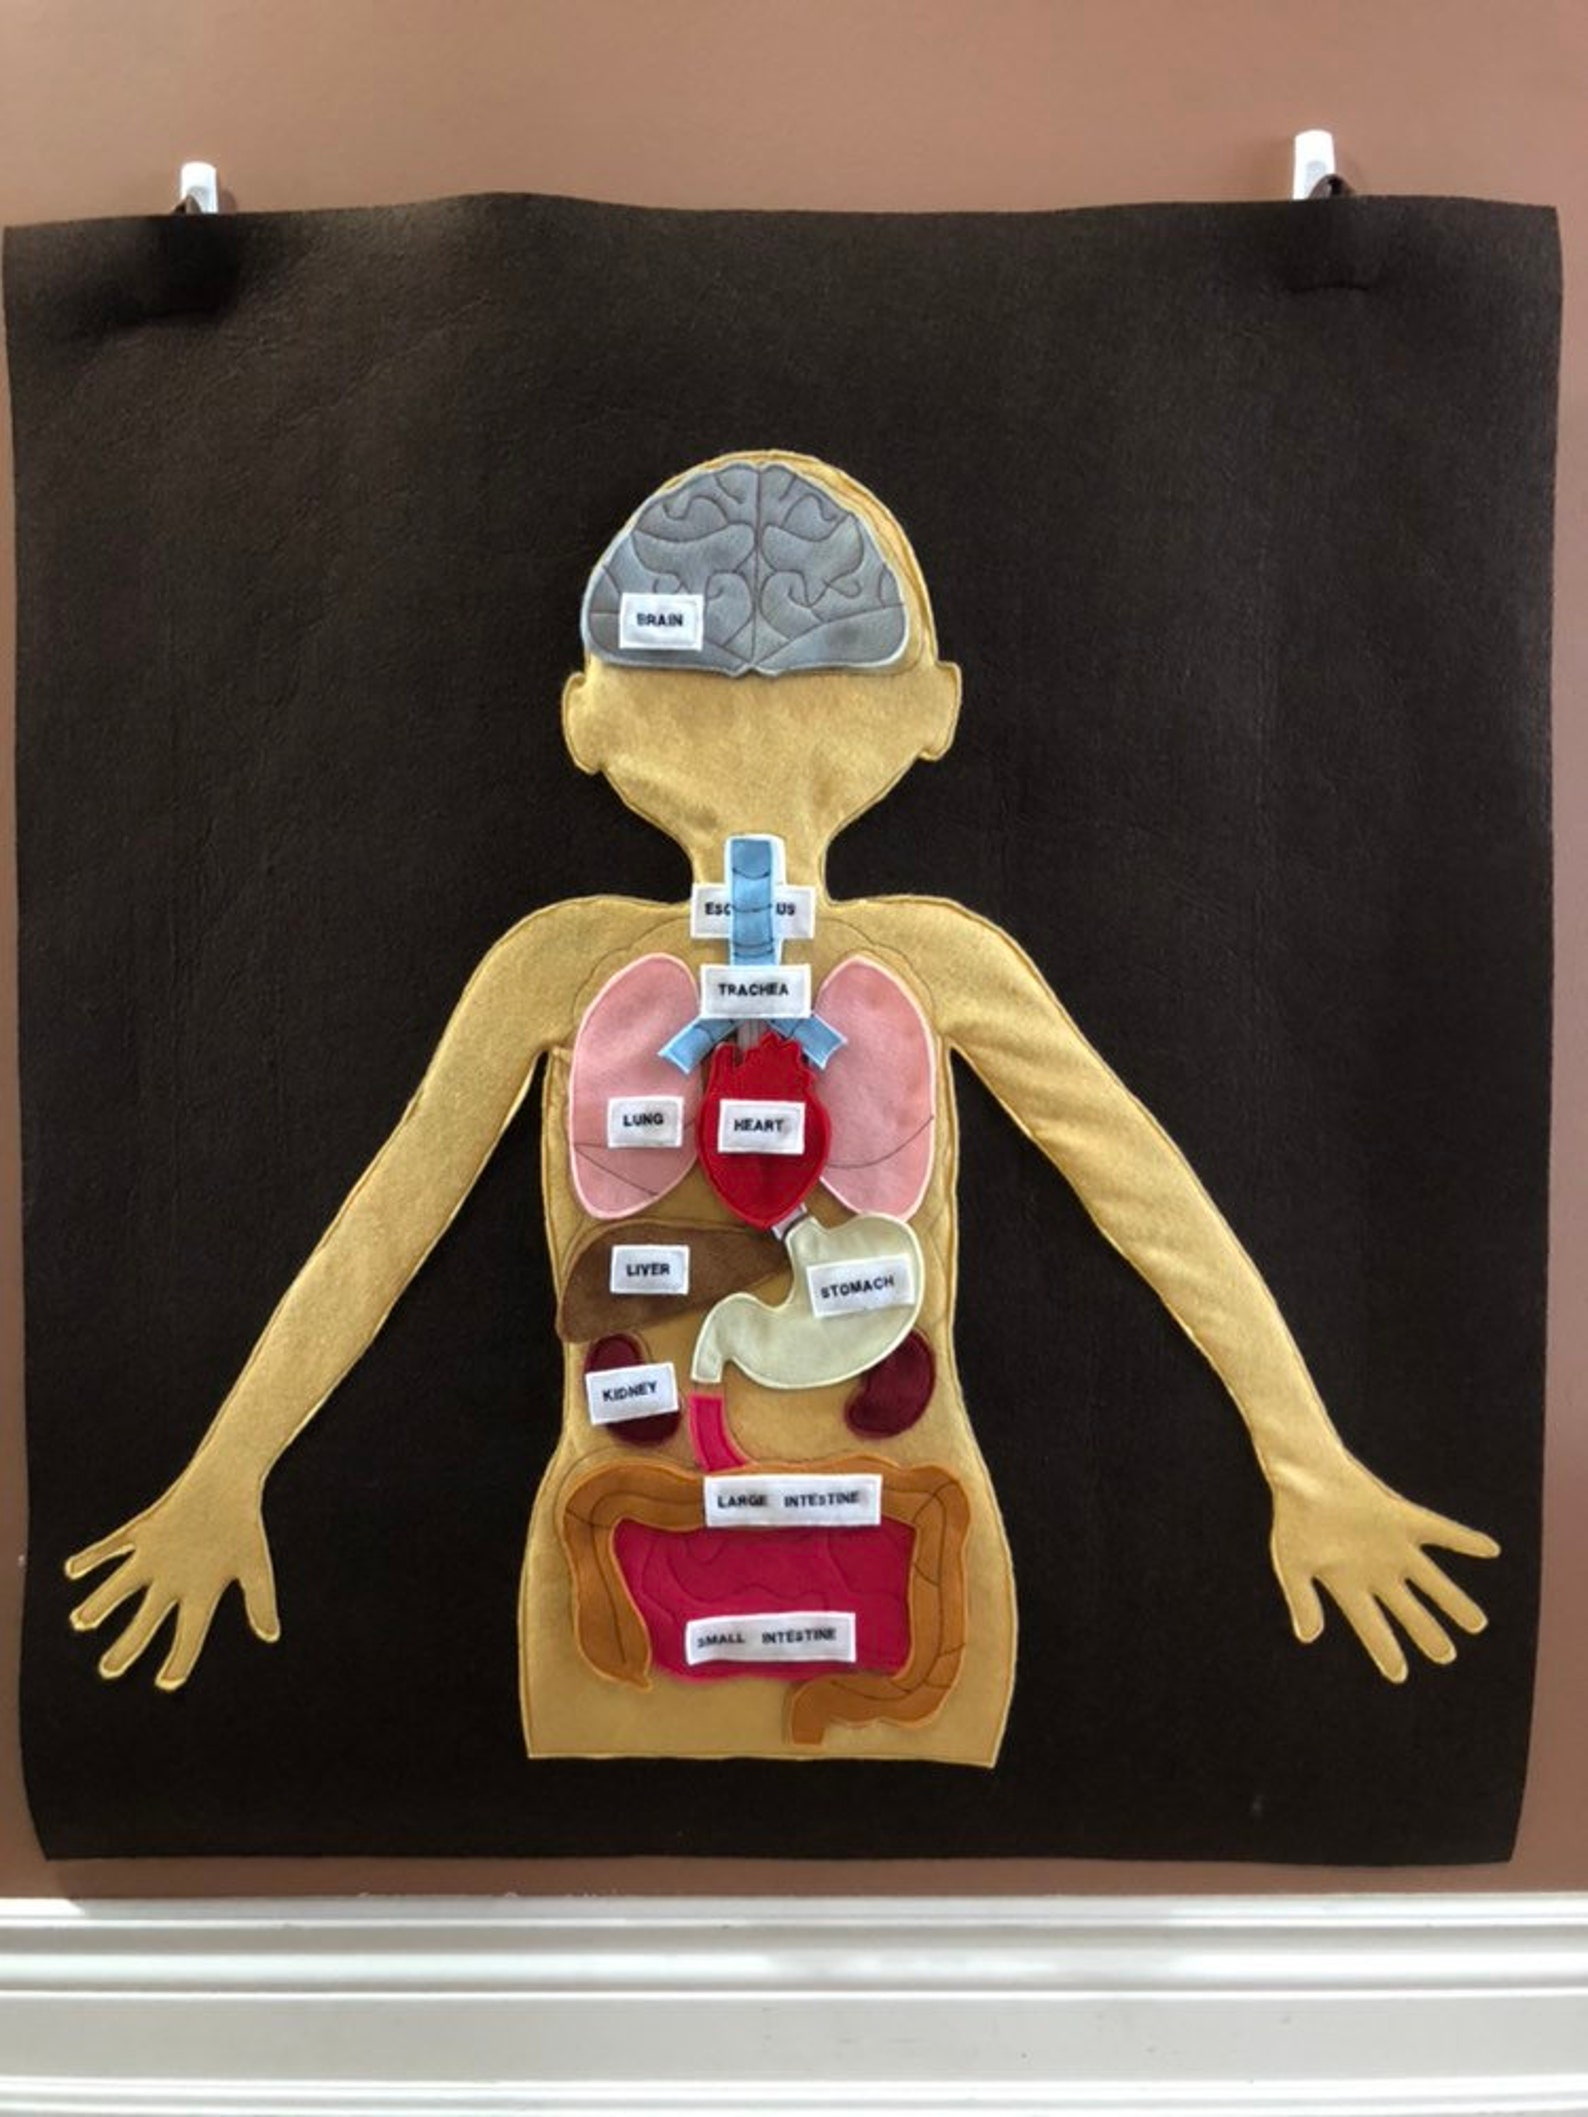 Felt Learning Wall of Human Body